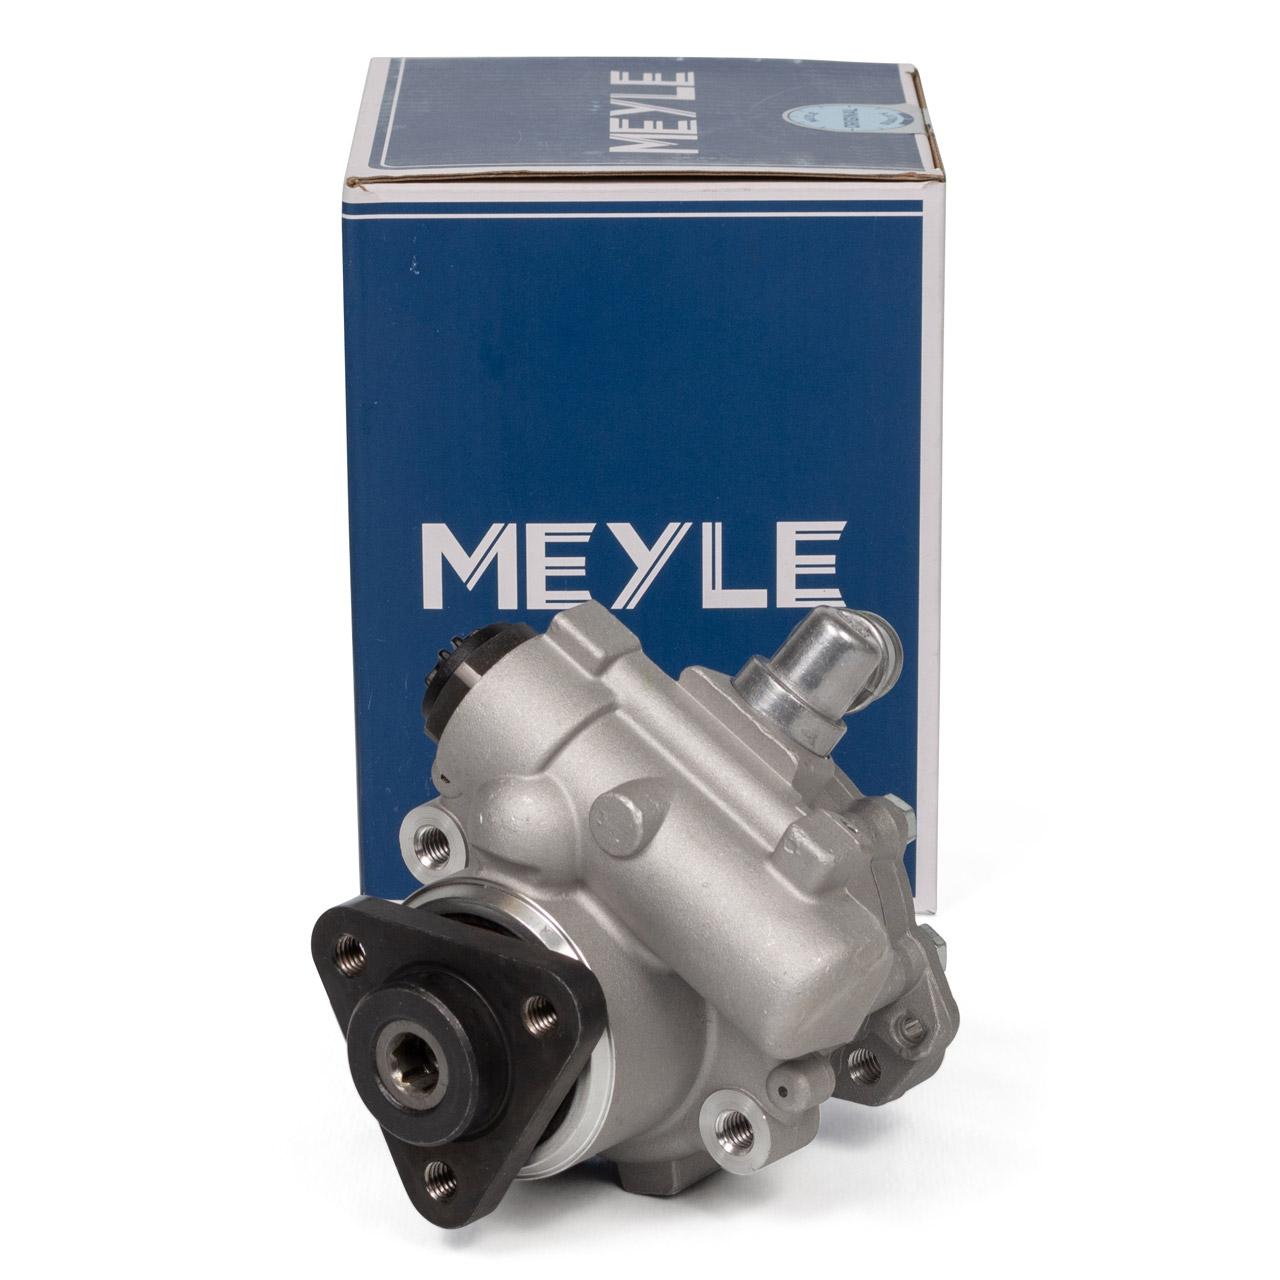 MEYLE Servopumpe Hydraulikpumpe BMW 320-330i | E36 ab 10.95 E46 09.01-09.02